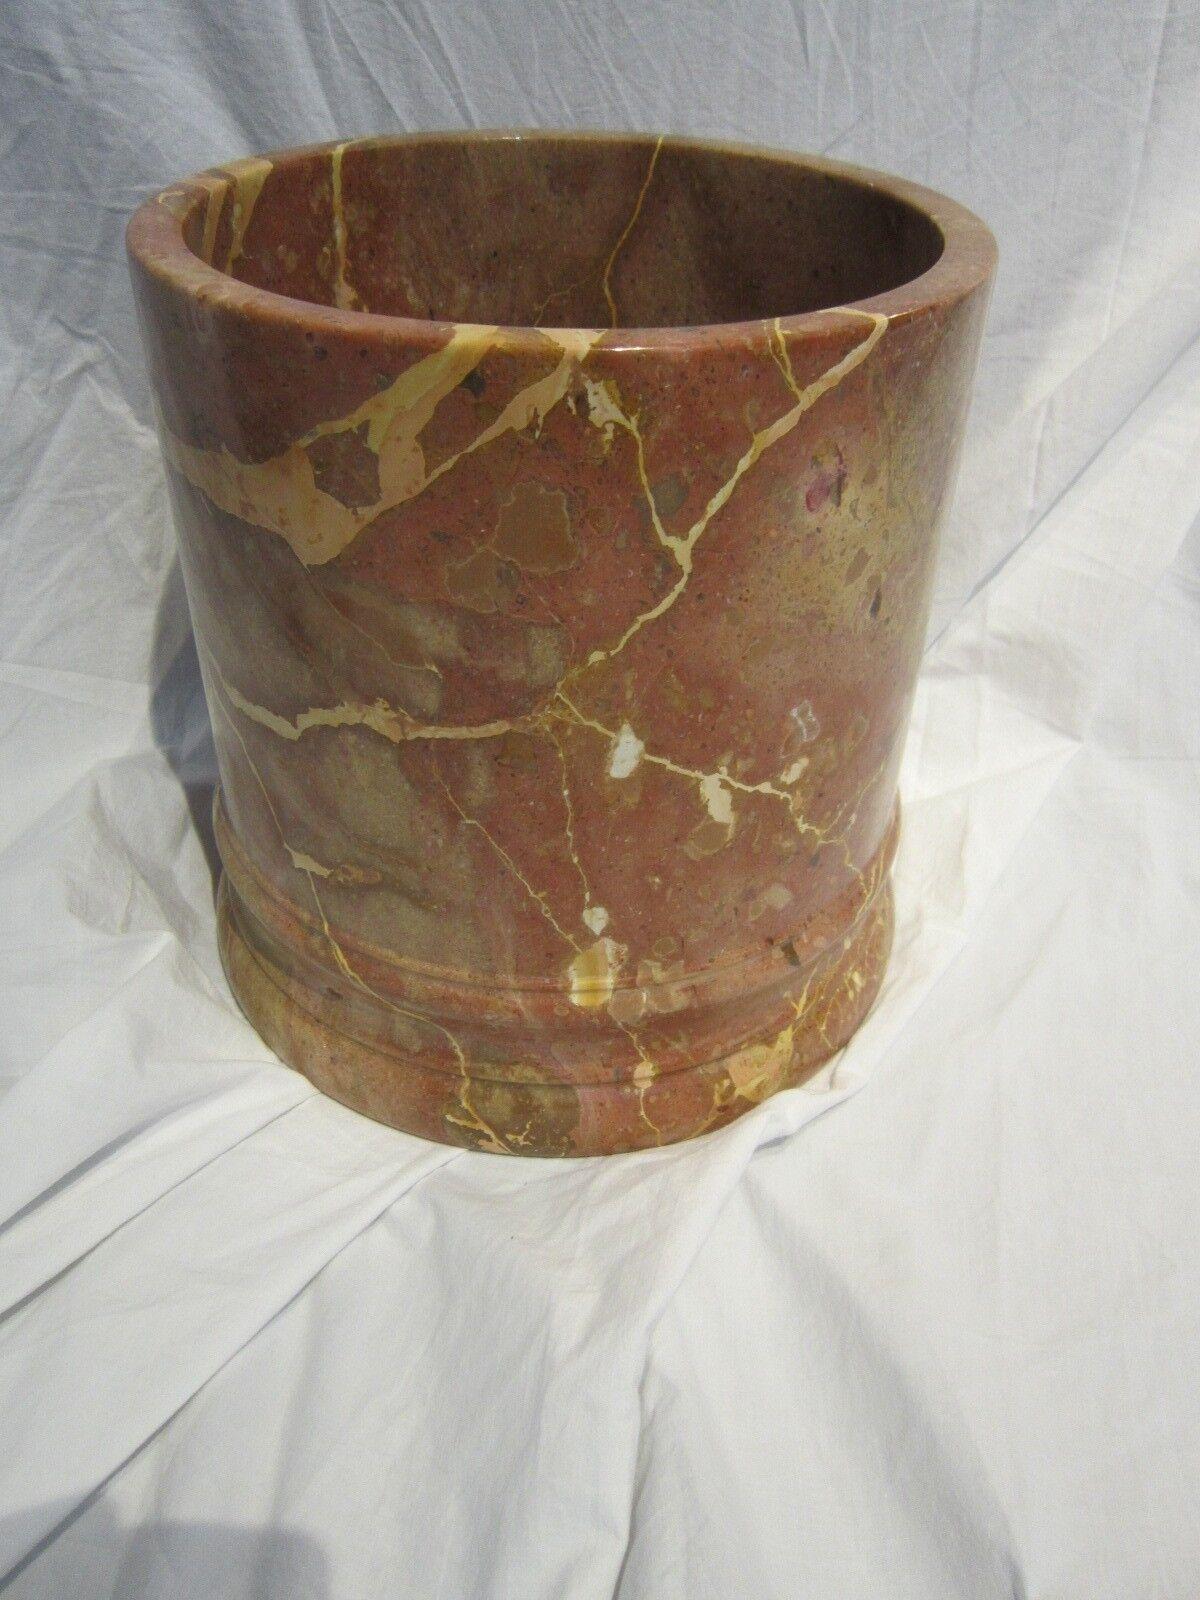 Frontgate Marble Round Bathroom Wastebasket Peachy with Gorgeous Veining EUC